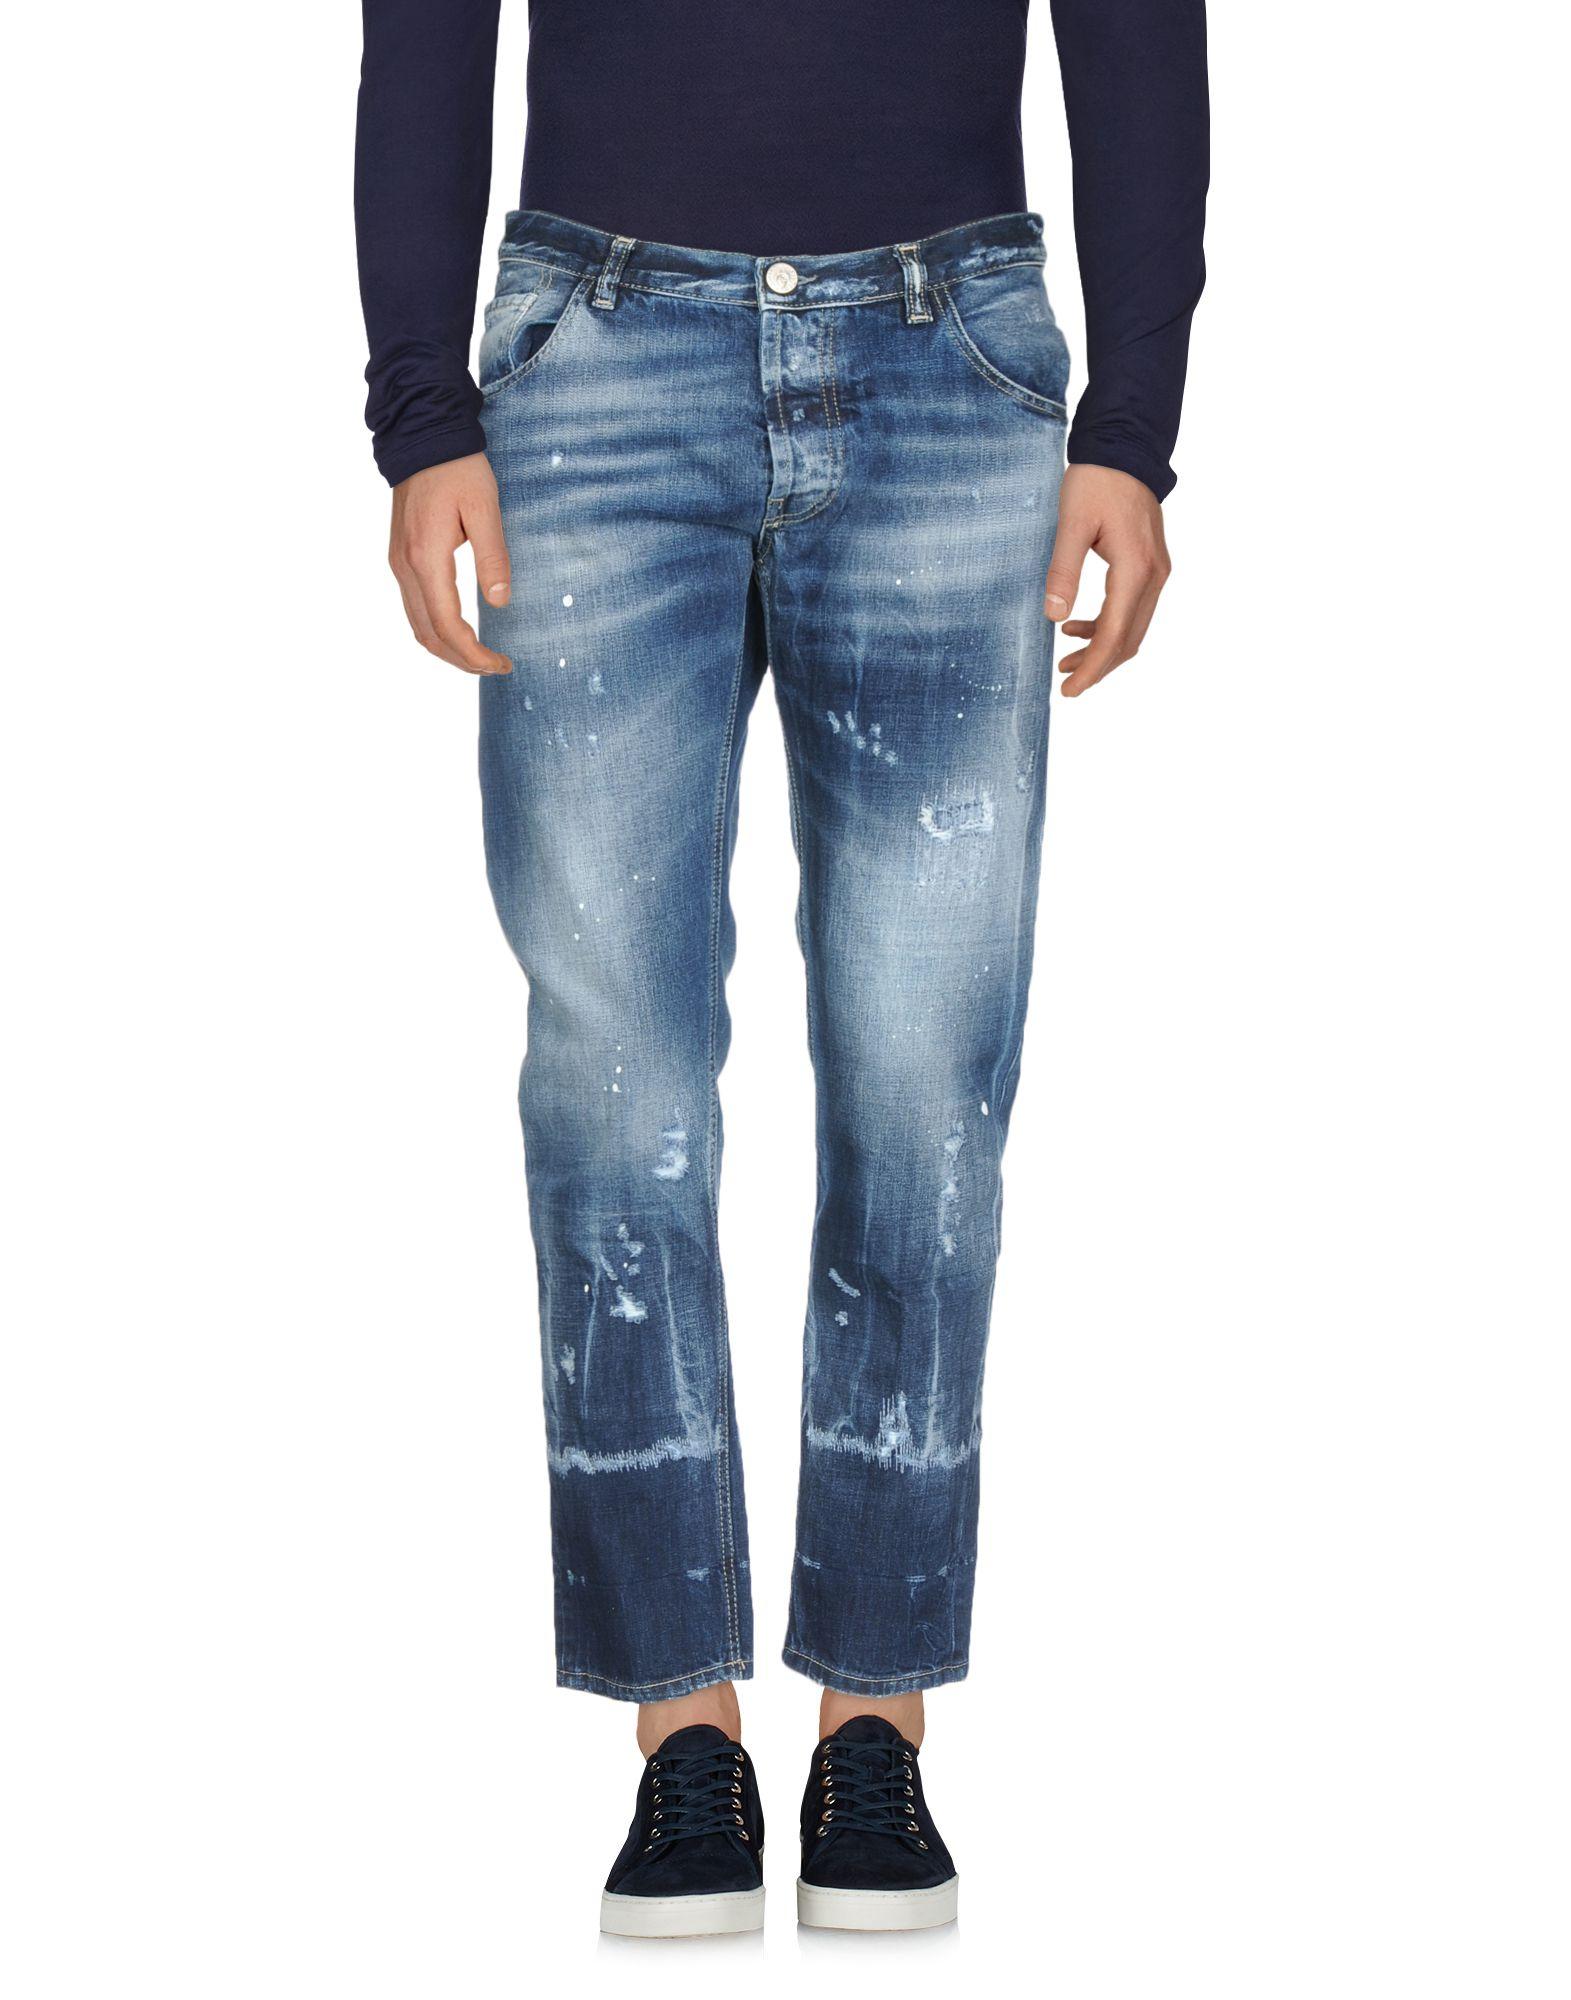 Pantaloni Jeans Pmds Premium Mood Denim Superior Donna - Acquista online su